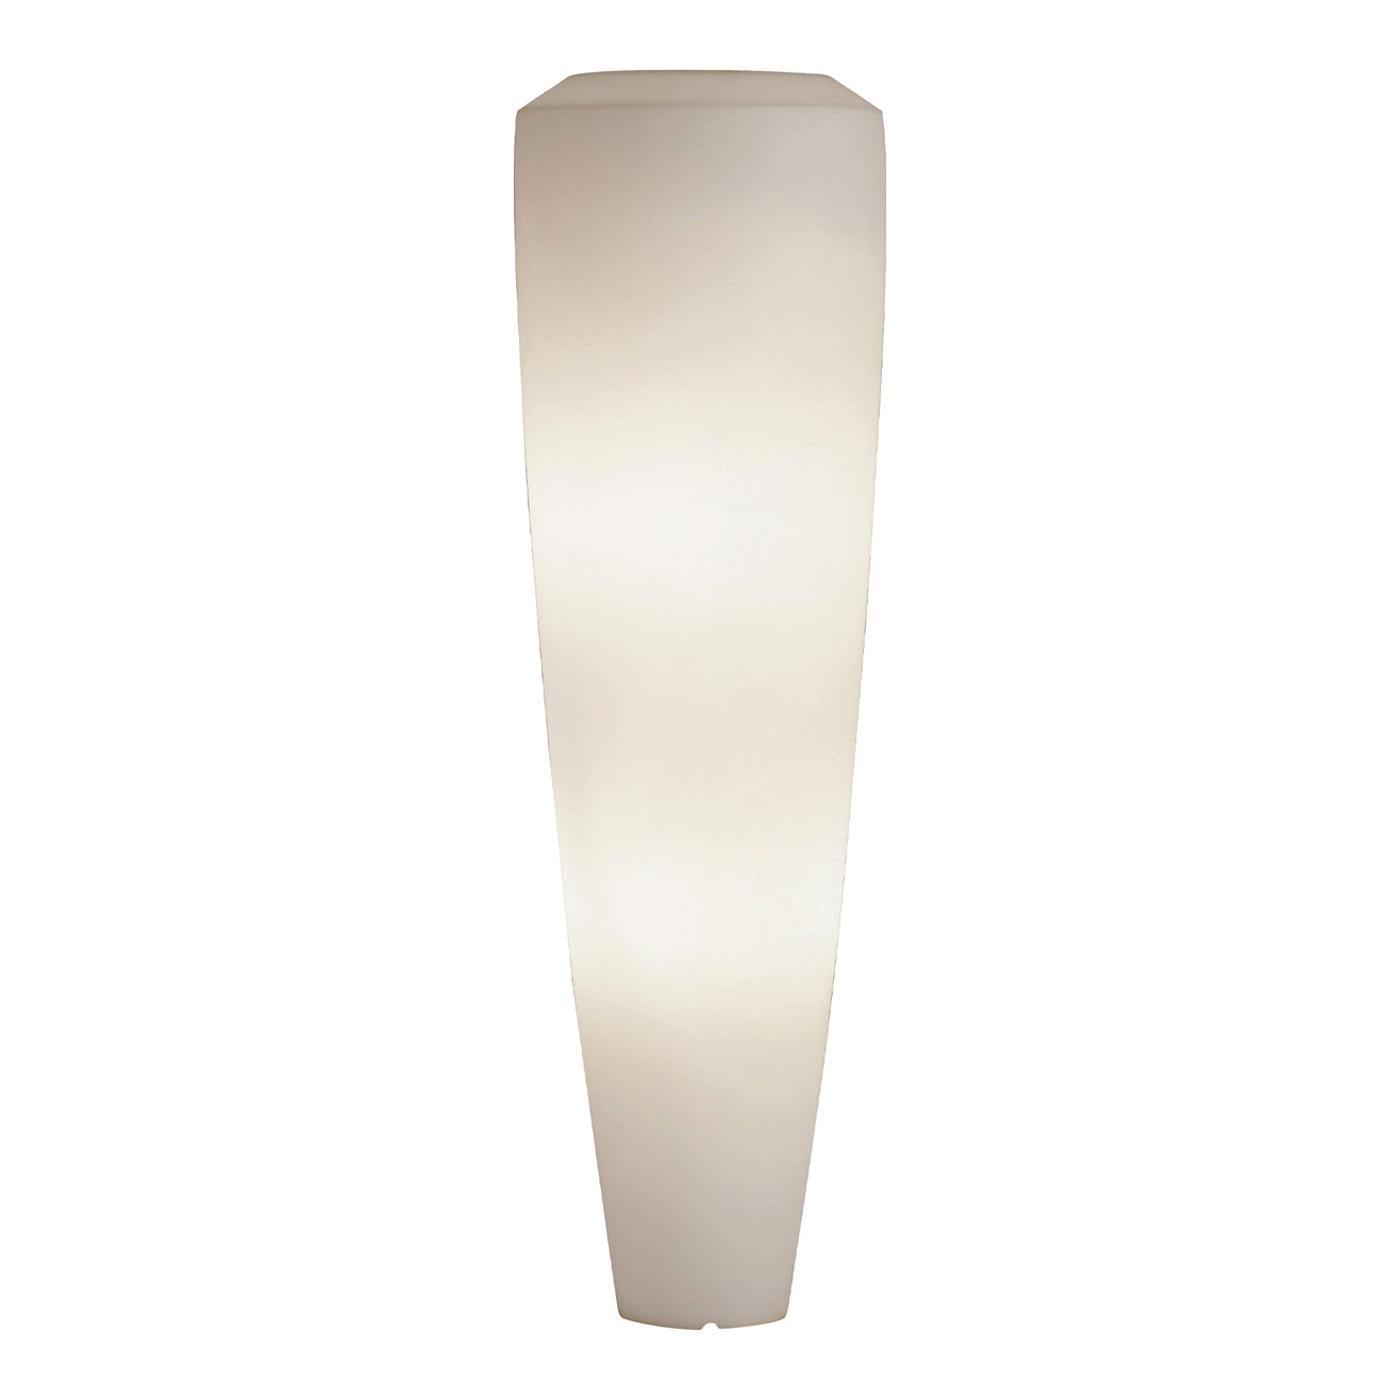 Obice Large White Floor Lamp